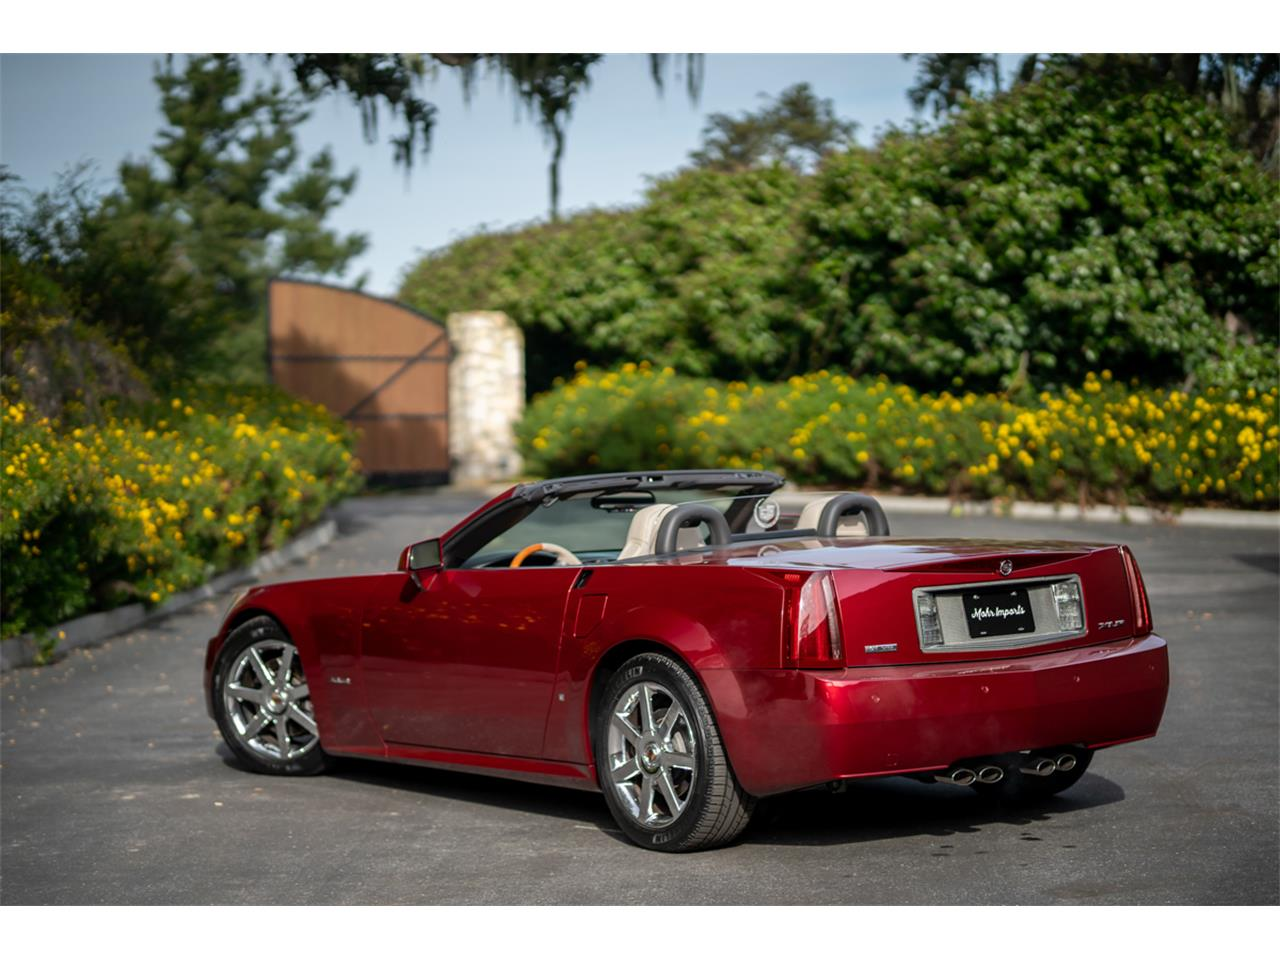 2006 Cadillac XLR for Sale   ClassicCars.com   CC-1321215